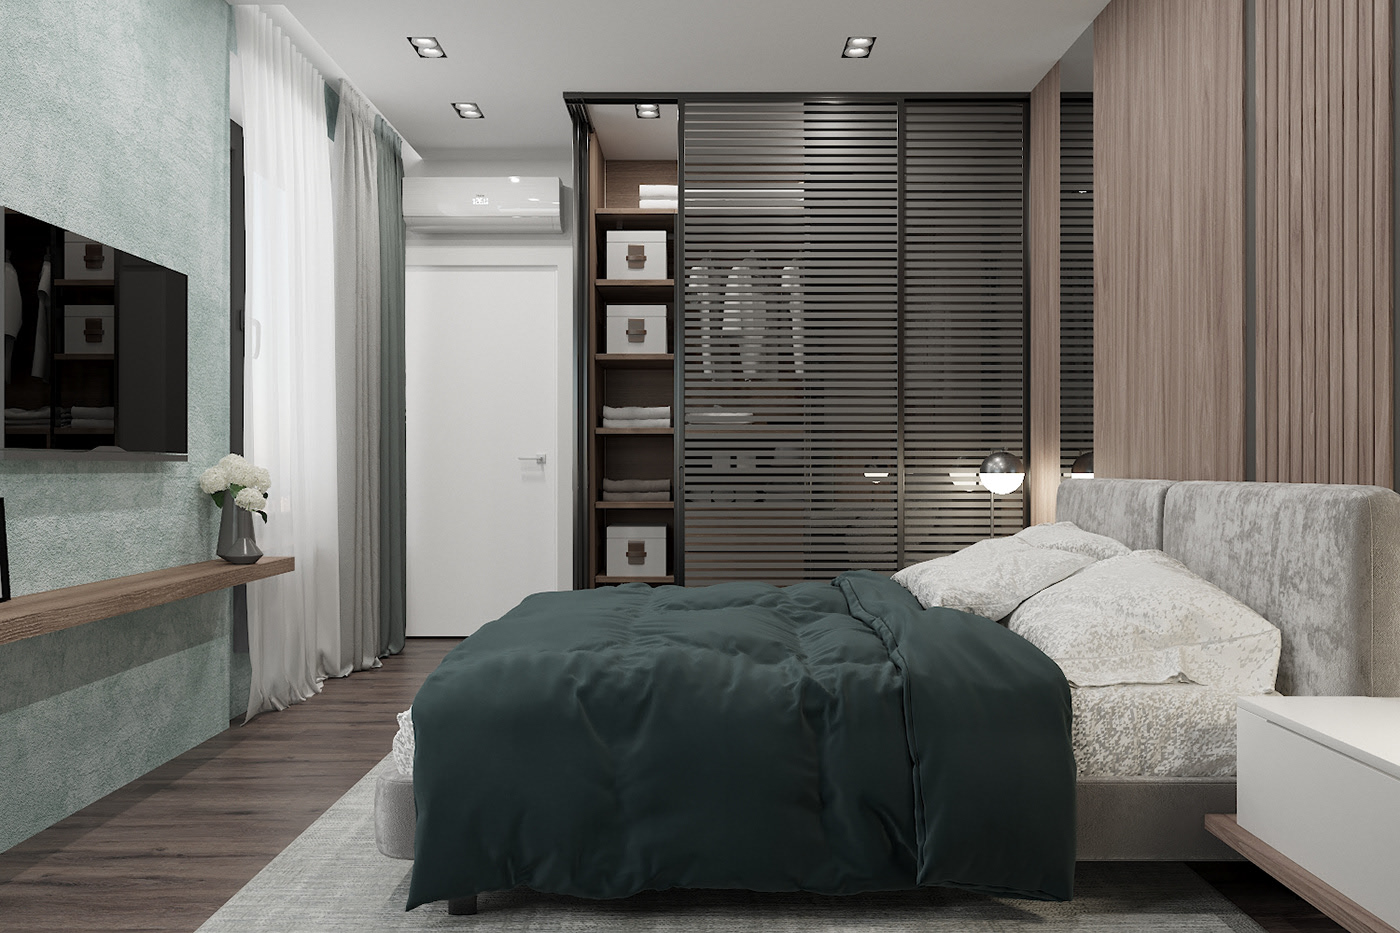 Modern style apartment interior design